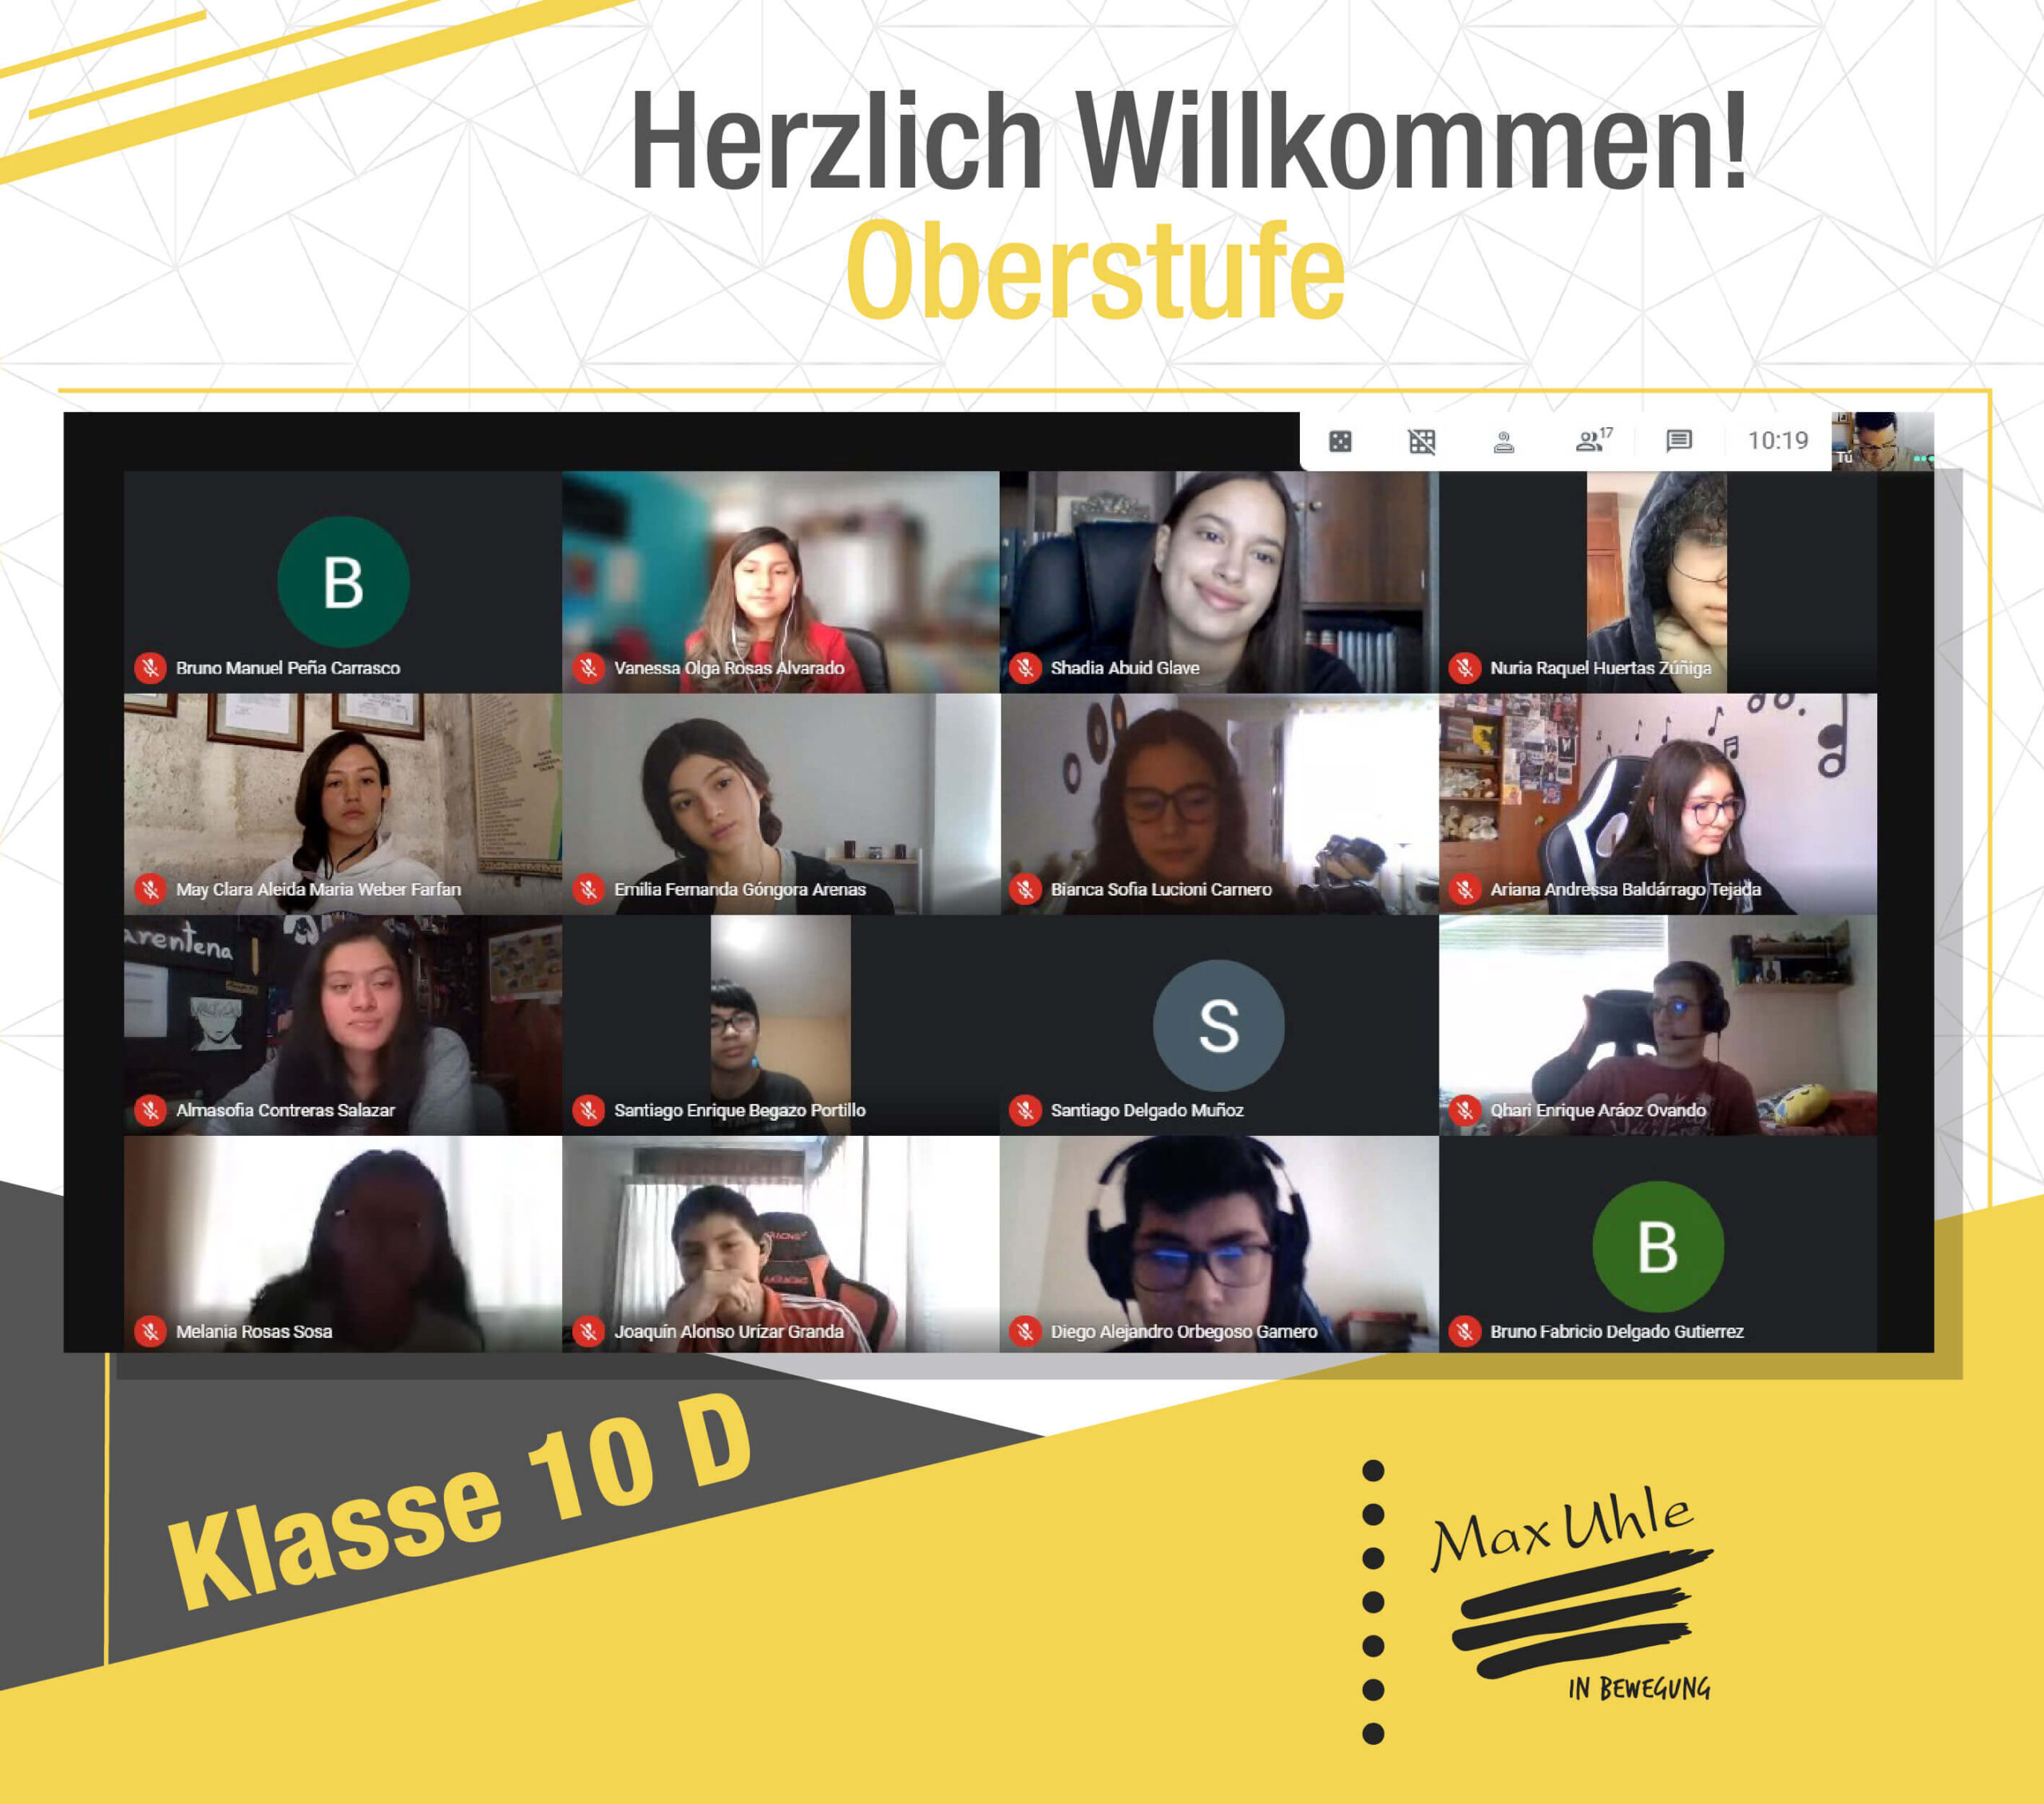 regreso a clases 2021 Oberstufe 10D